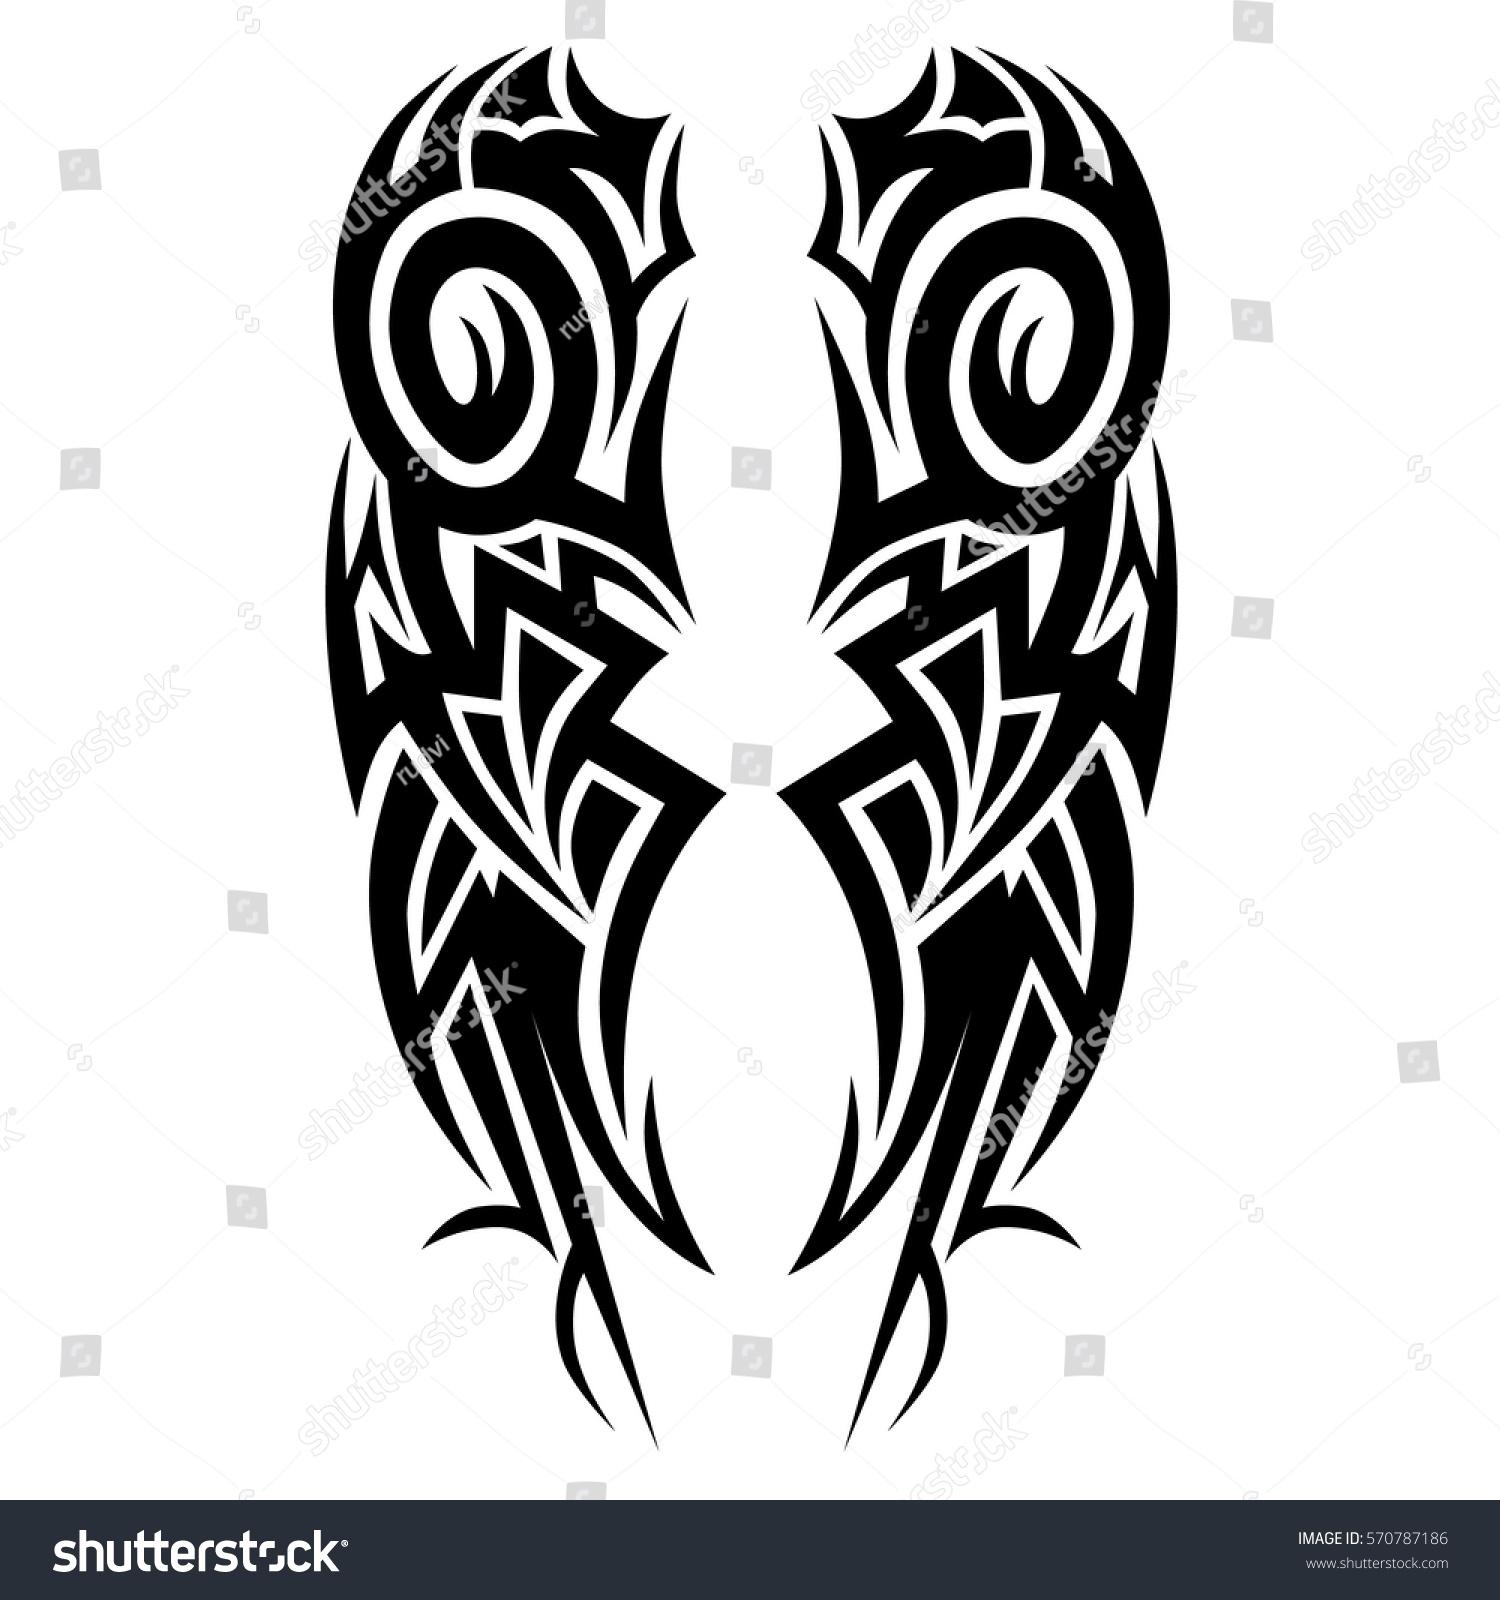 Tattoo Designs Tattoo Tribal Vector Designs Stock Vector